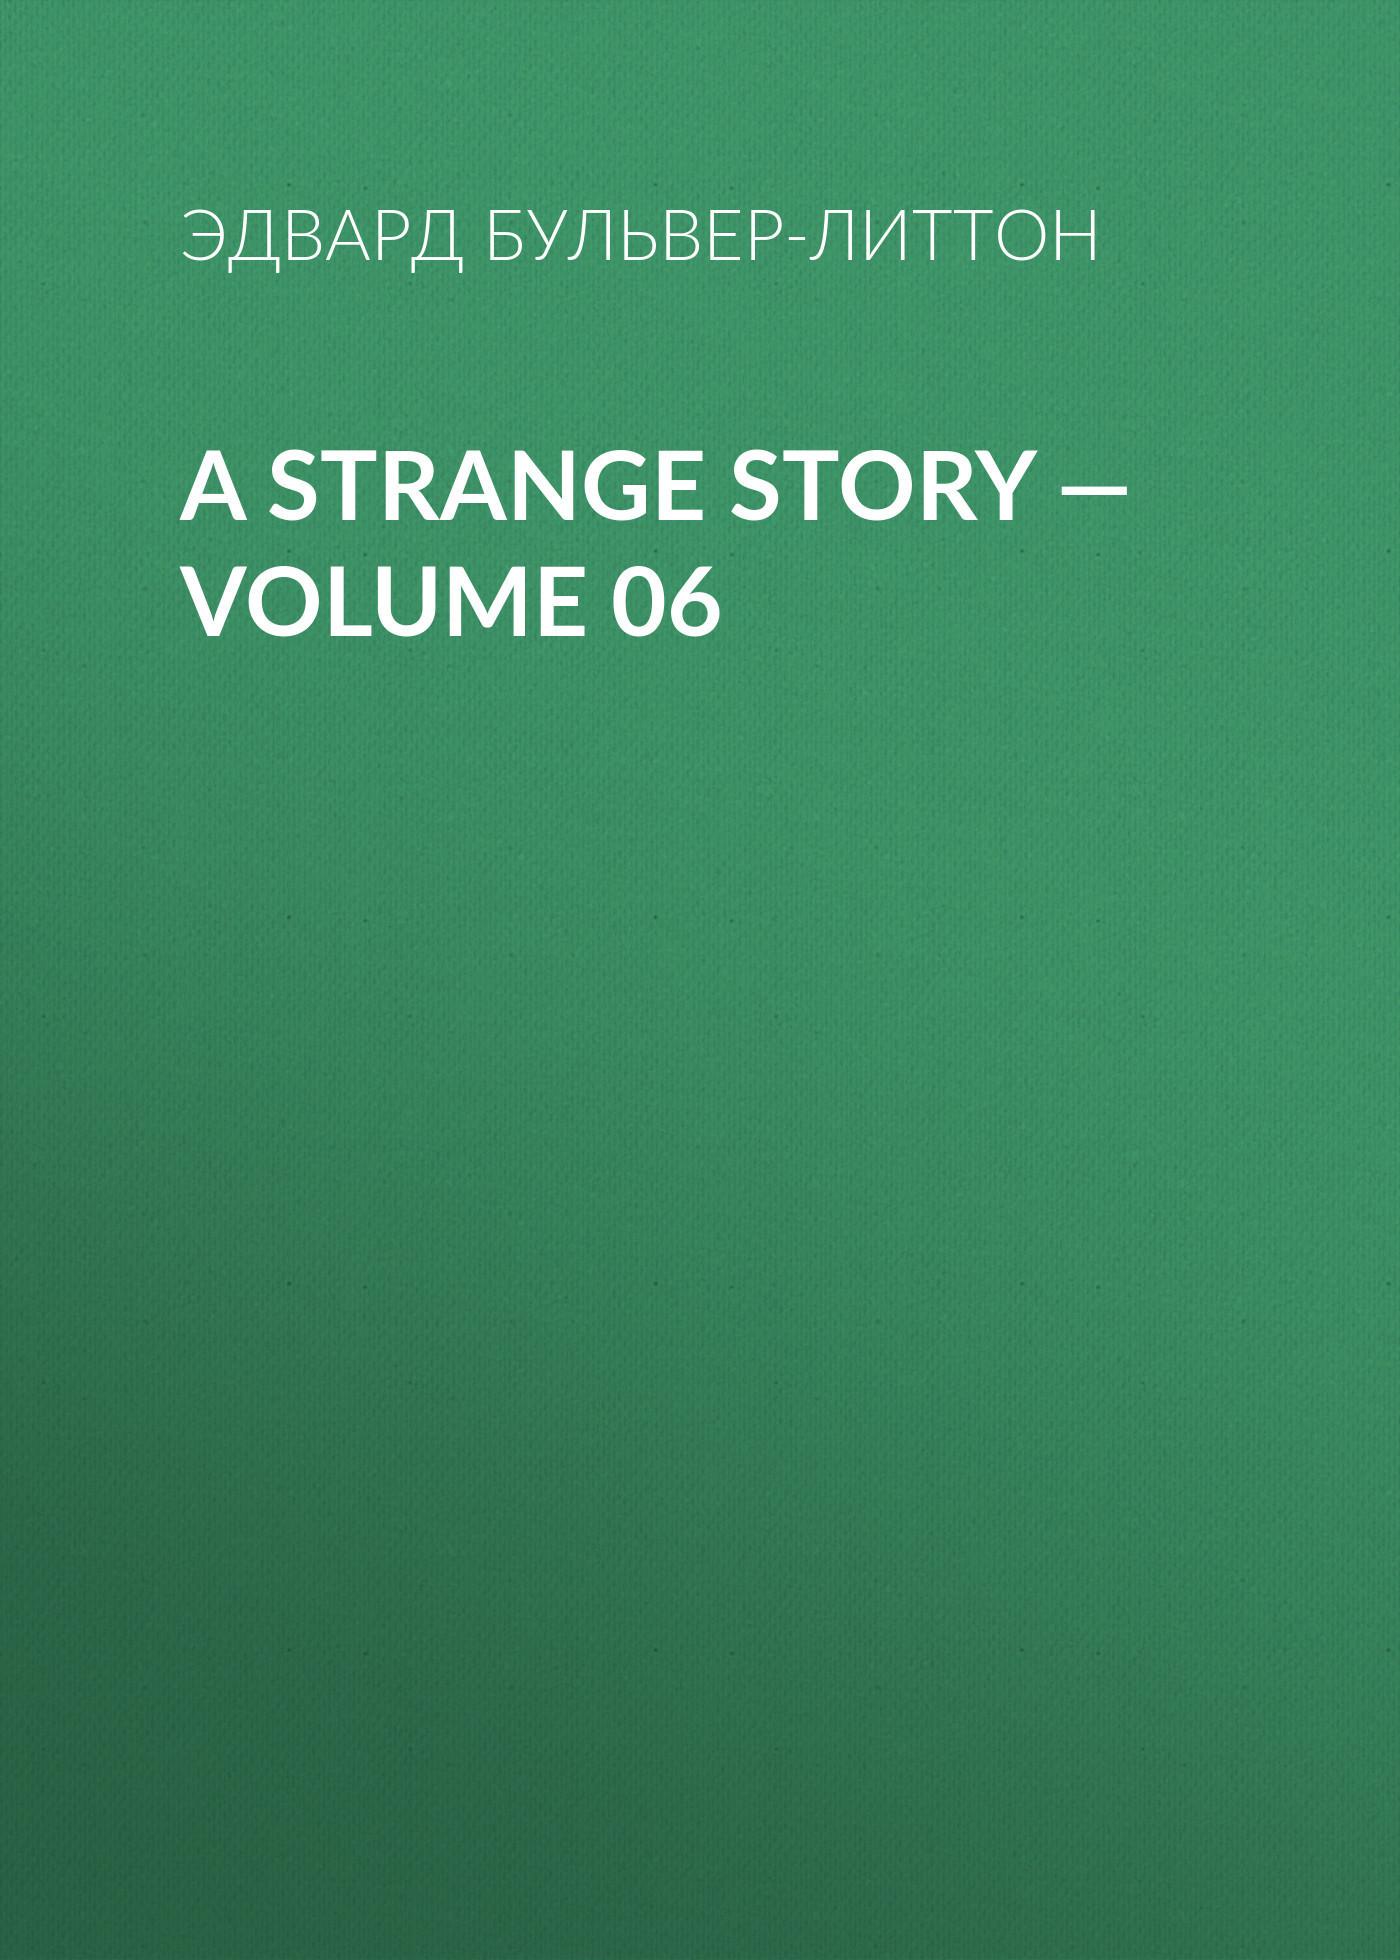 A Strange Story — Volume 06